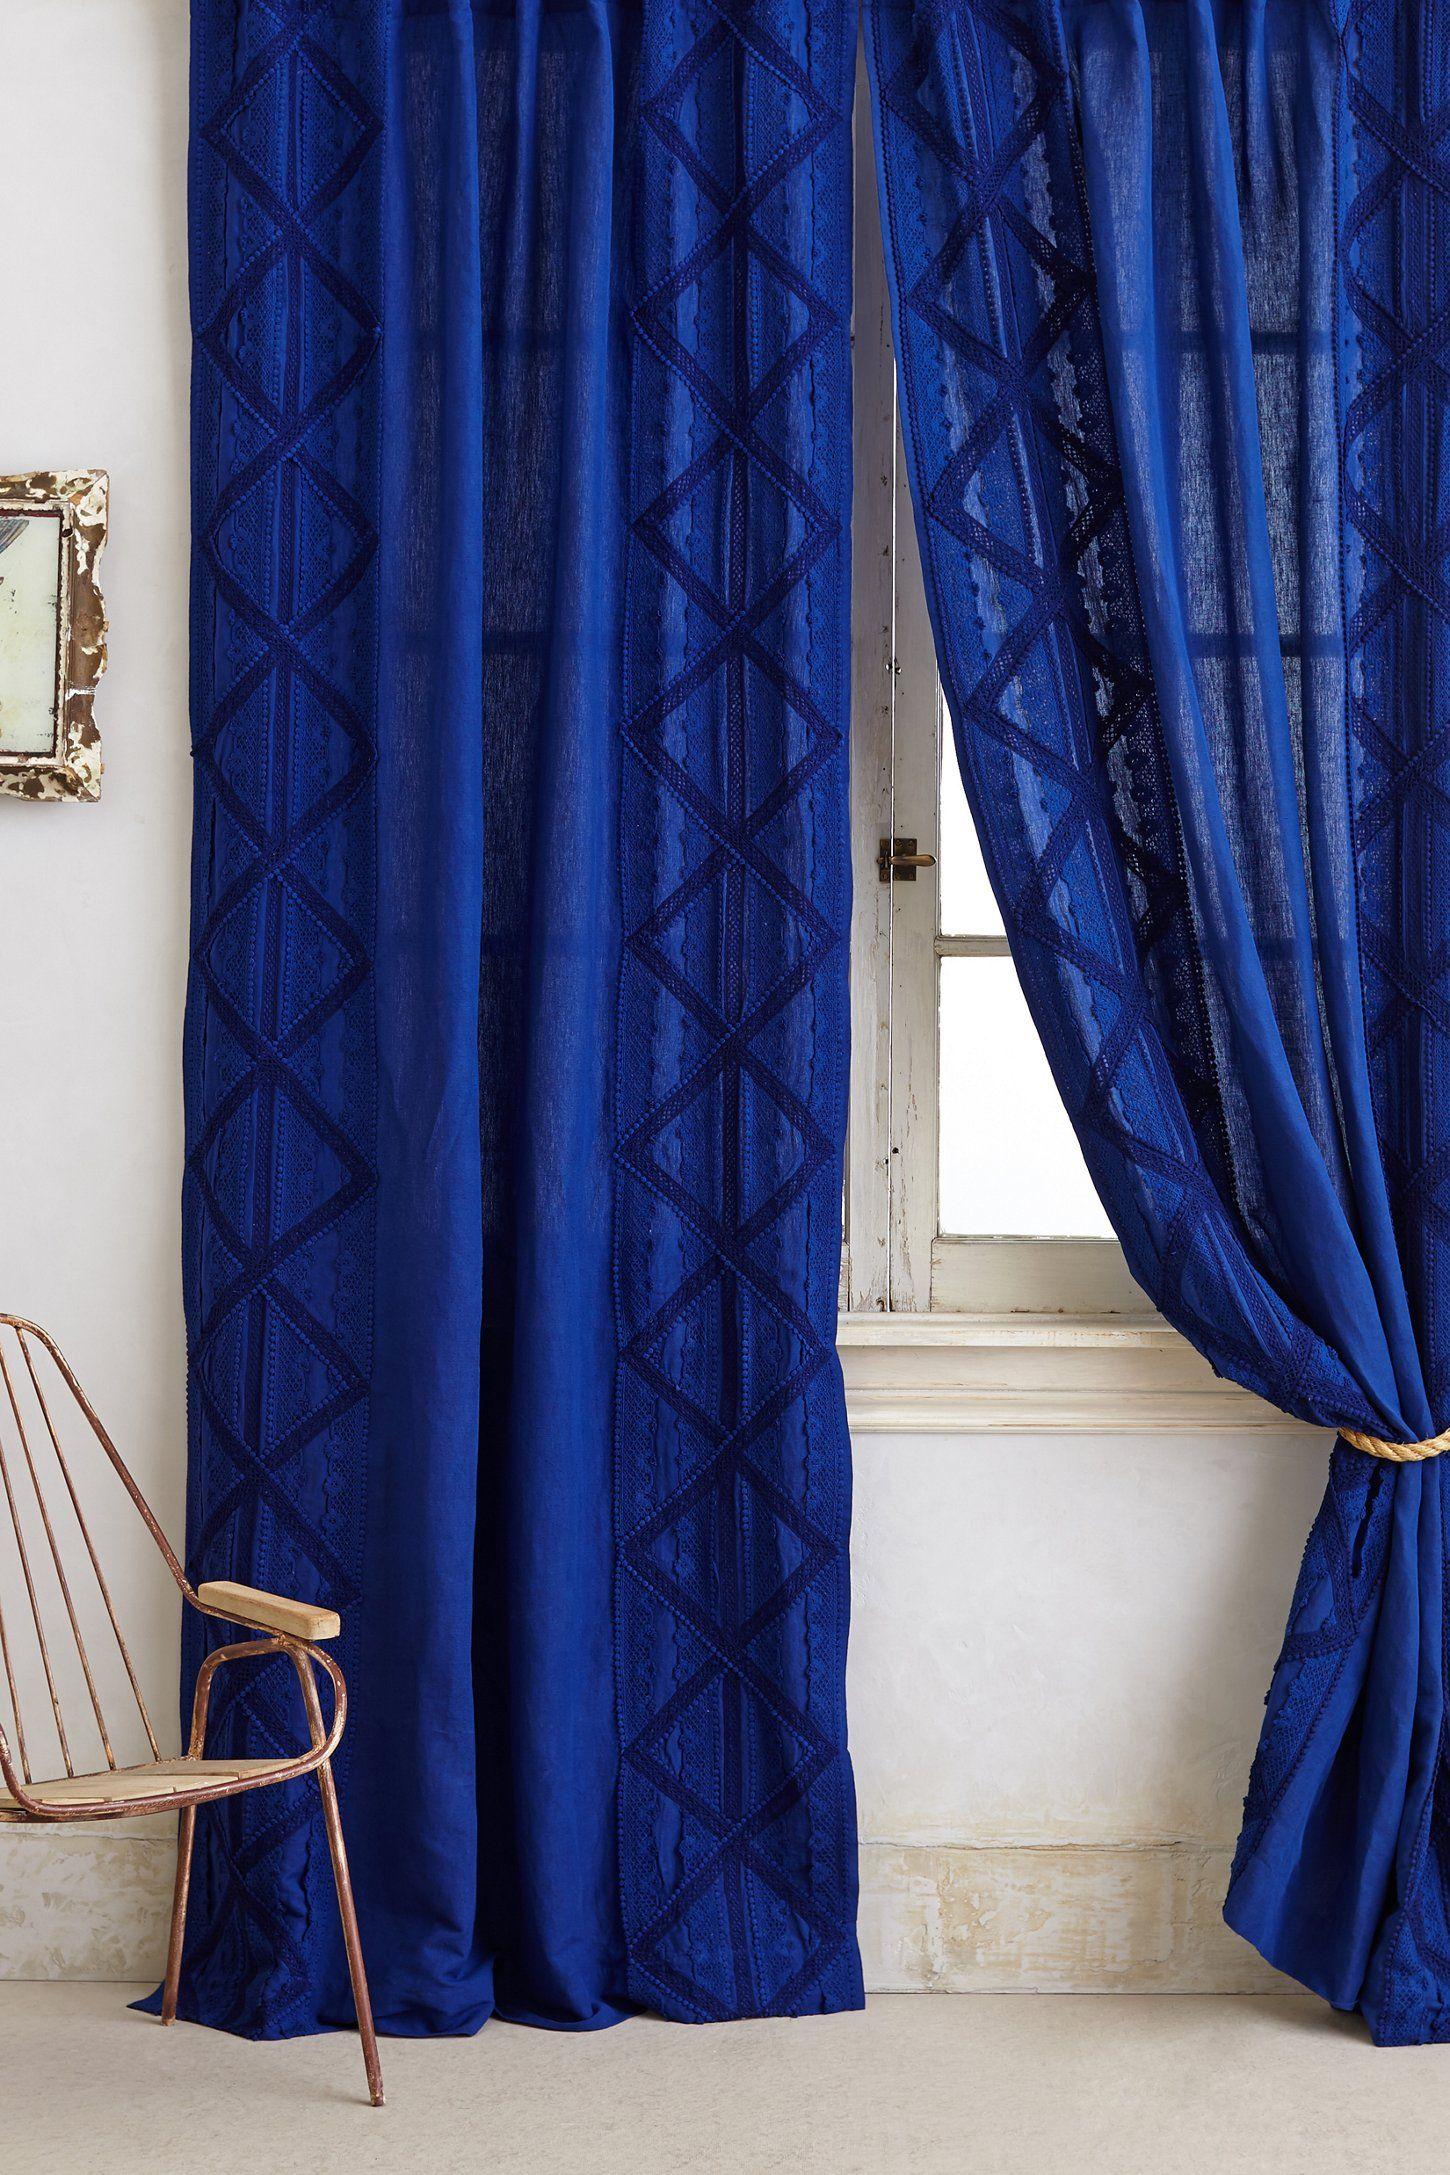 Appliqued Lace Curtain | Royal blue bedrooms, Royal blue ...